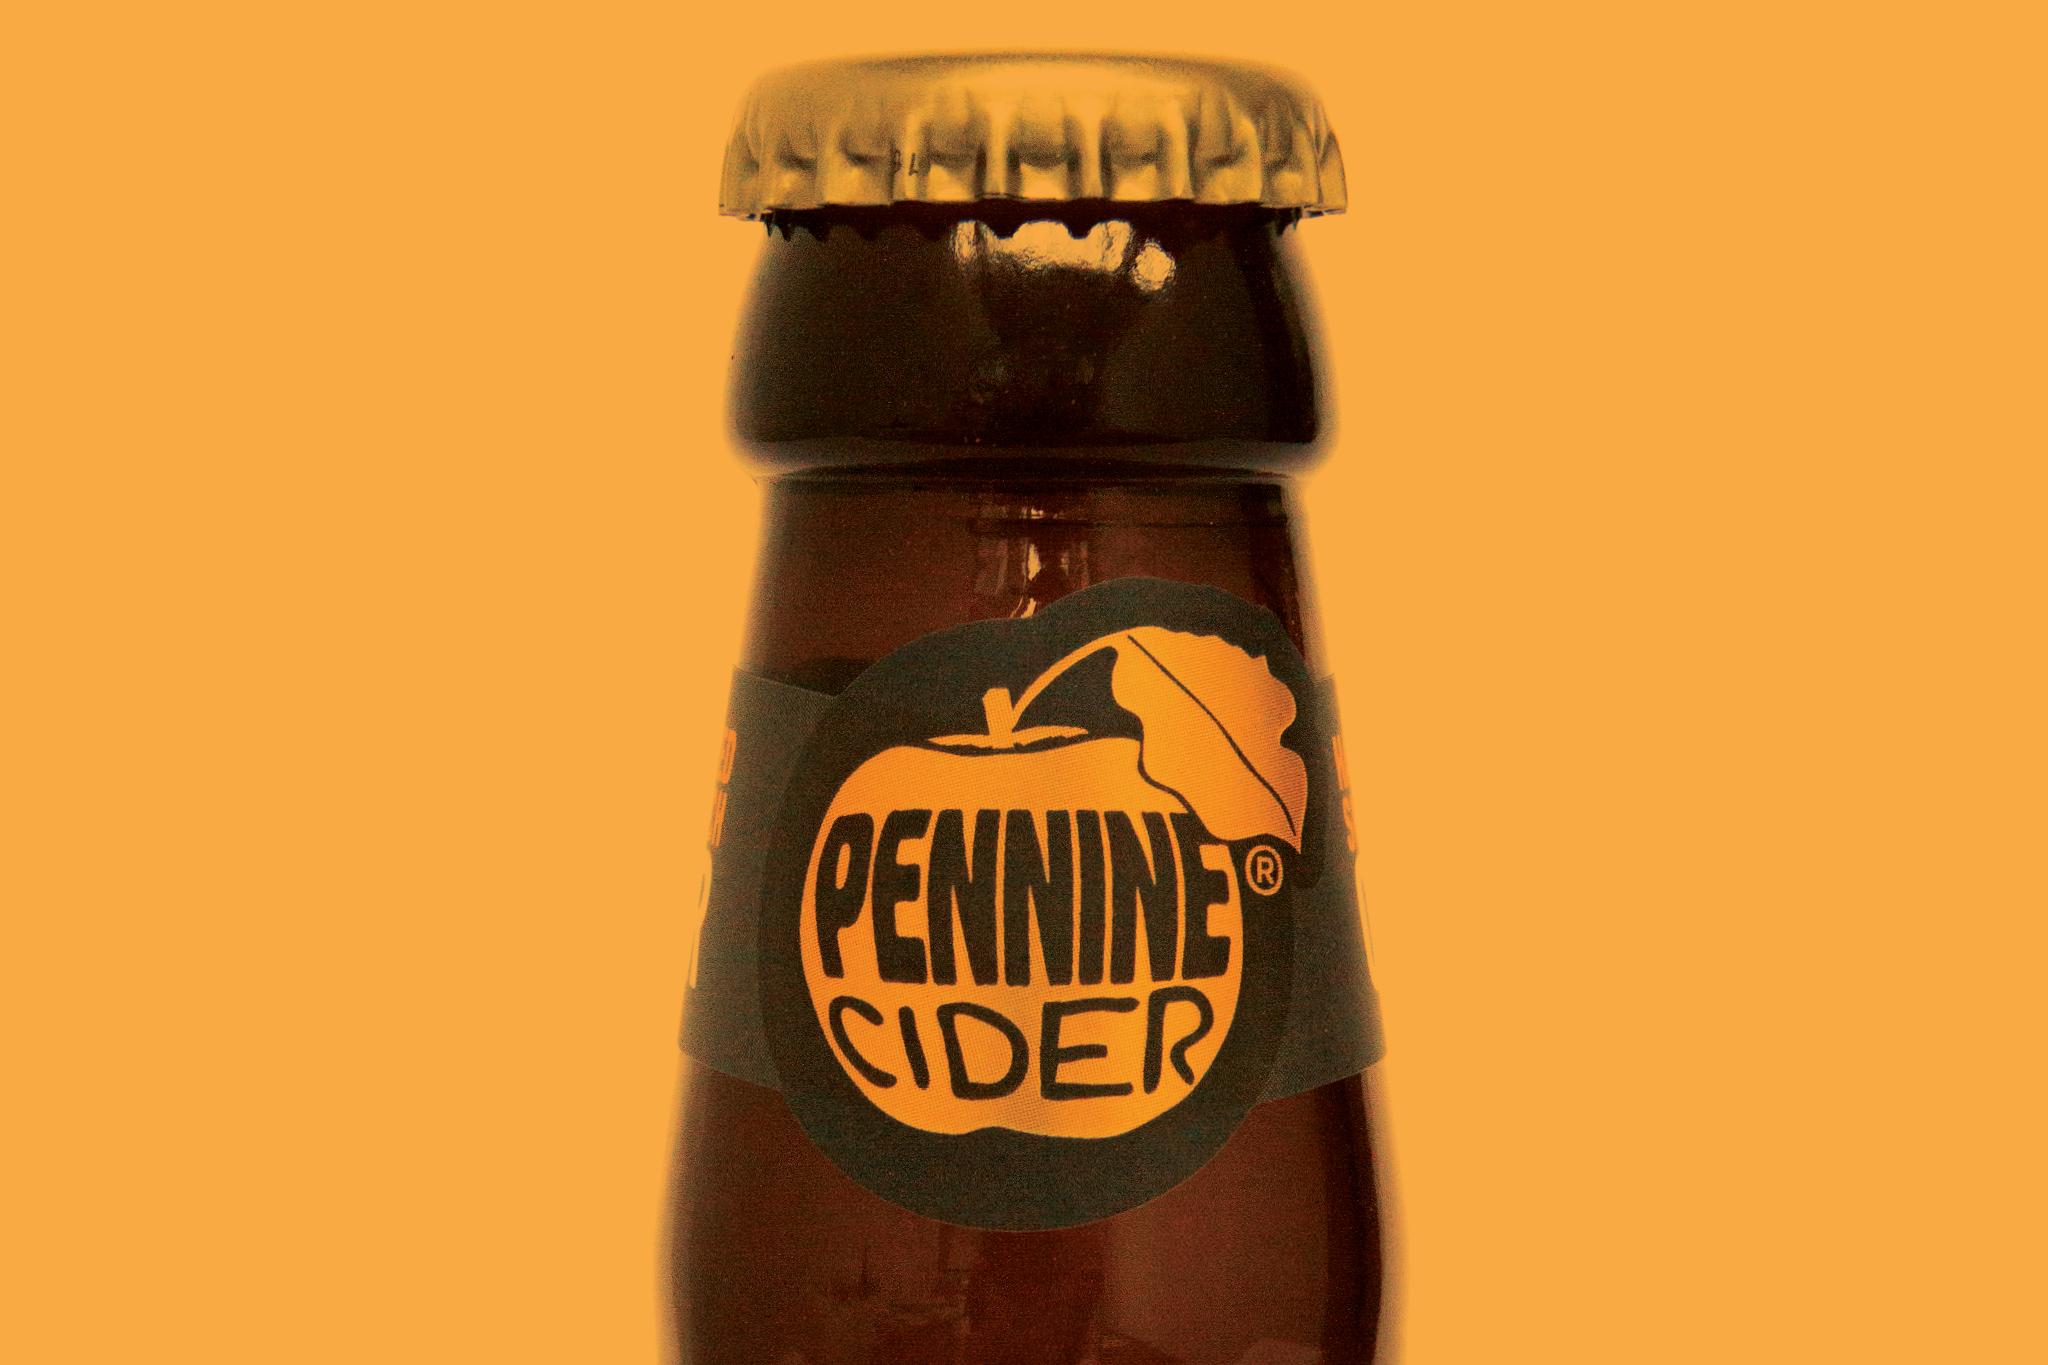 Pennine-Cider-web3.jpg